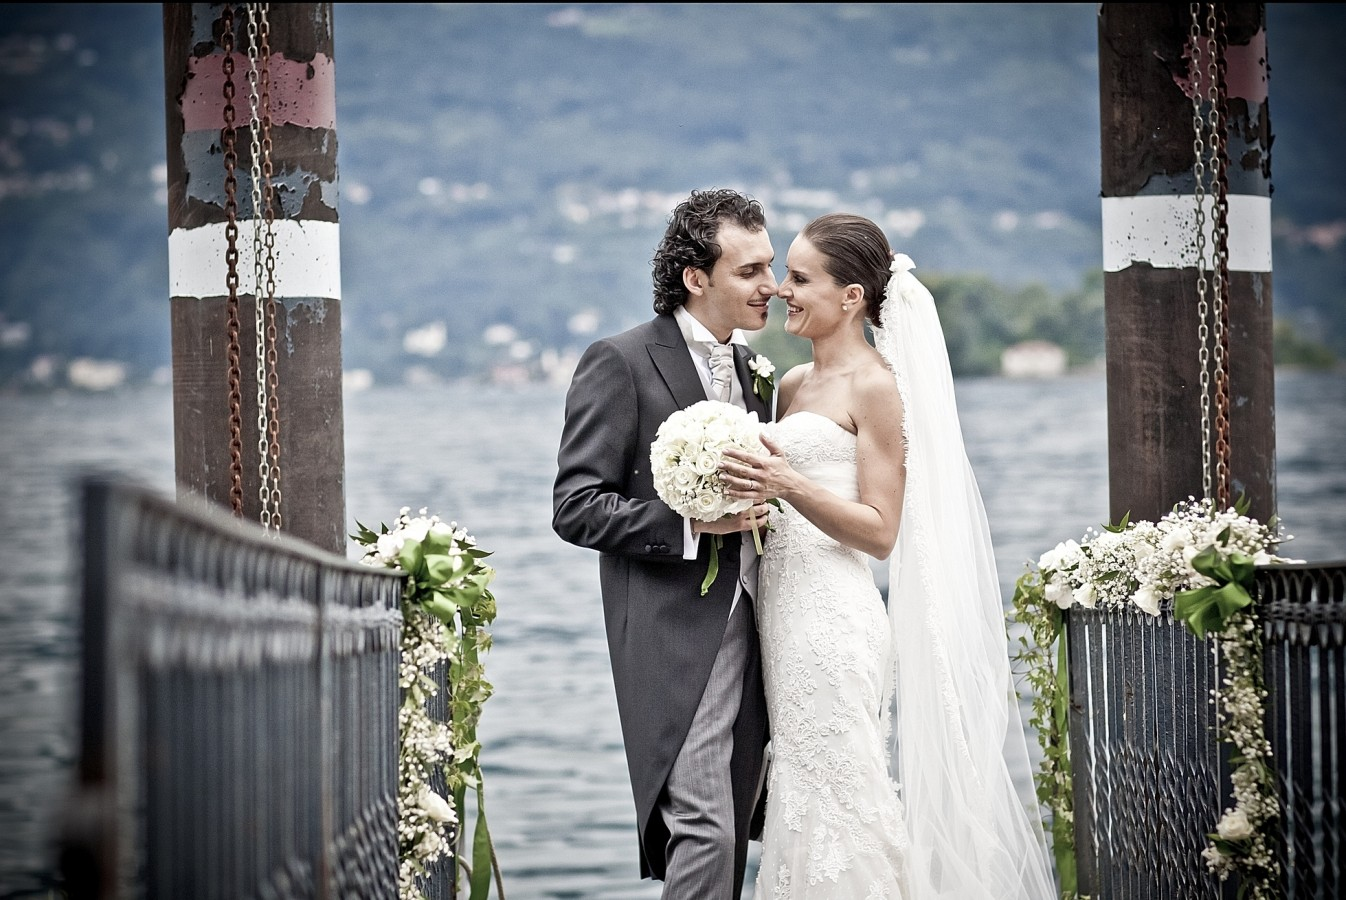 elope-to-italian-lakes